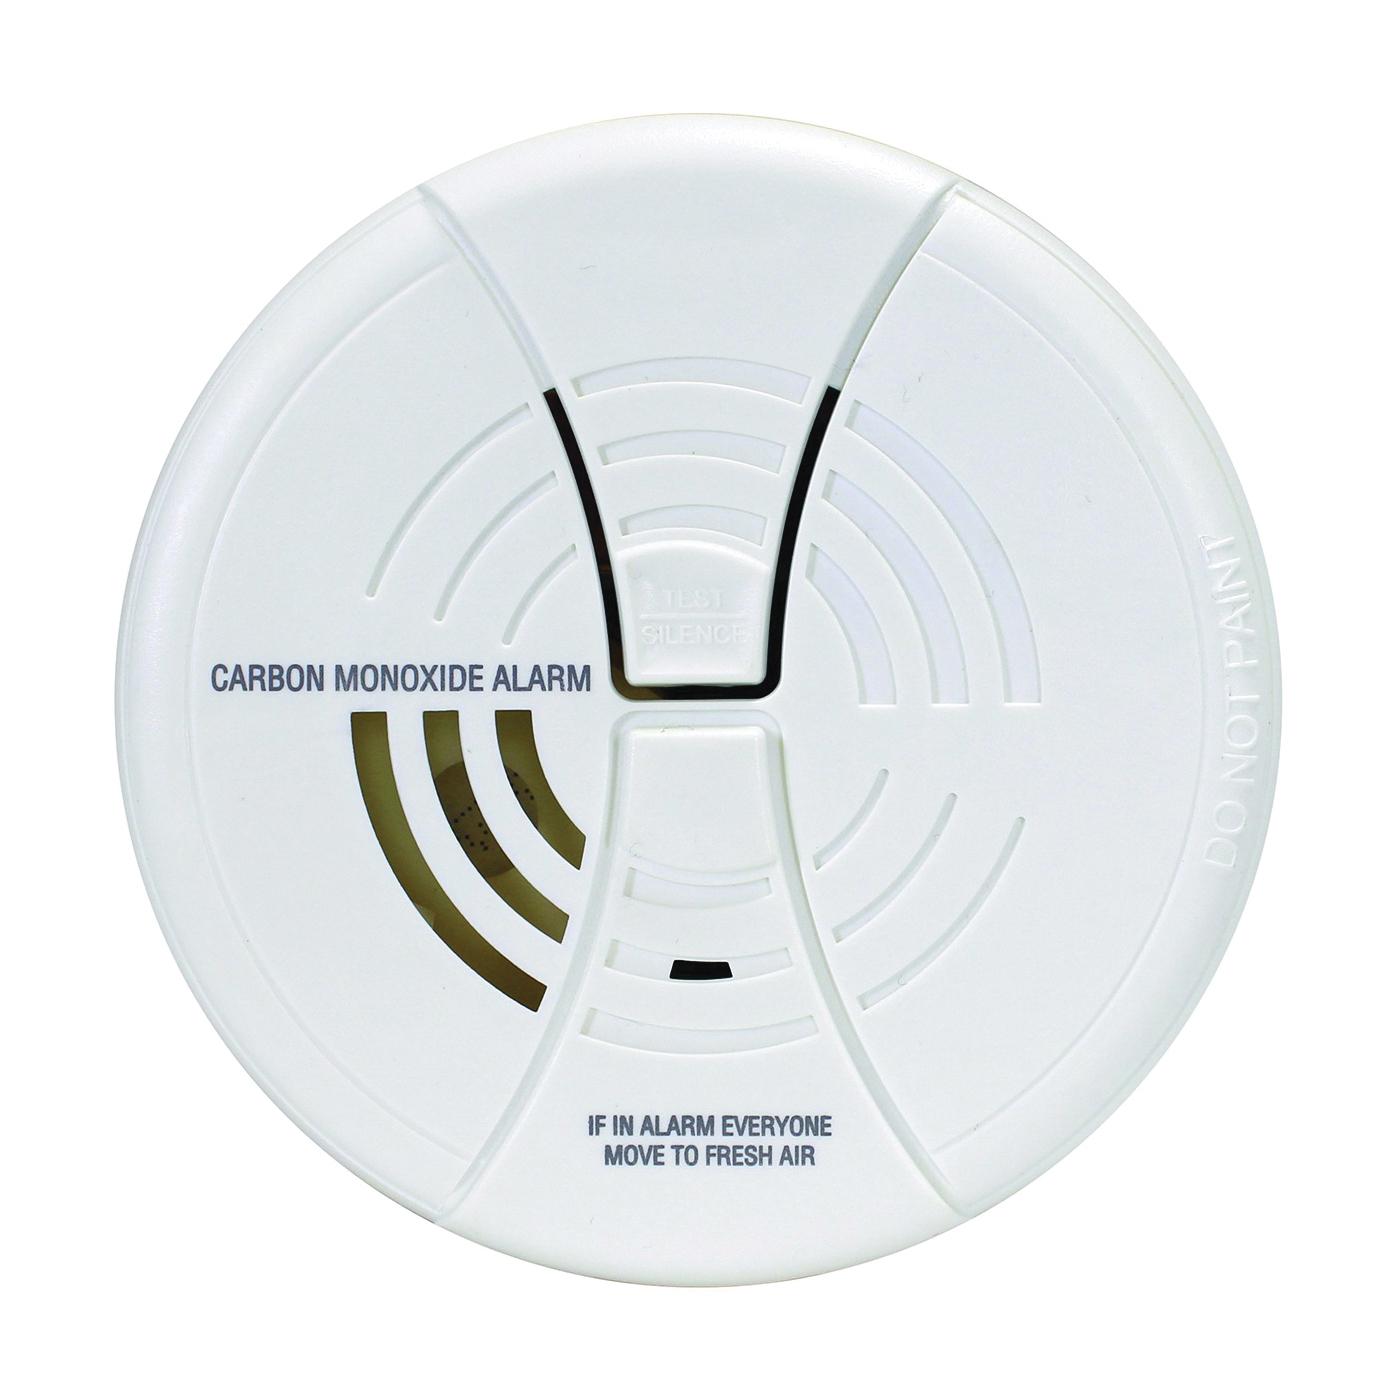 Picture of FIRST ALERT CO250B Carbon Monoxide Alarm, 85 dB, Alarm: Audible/Visual, Electrochemical Sensor, White